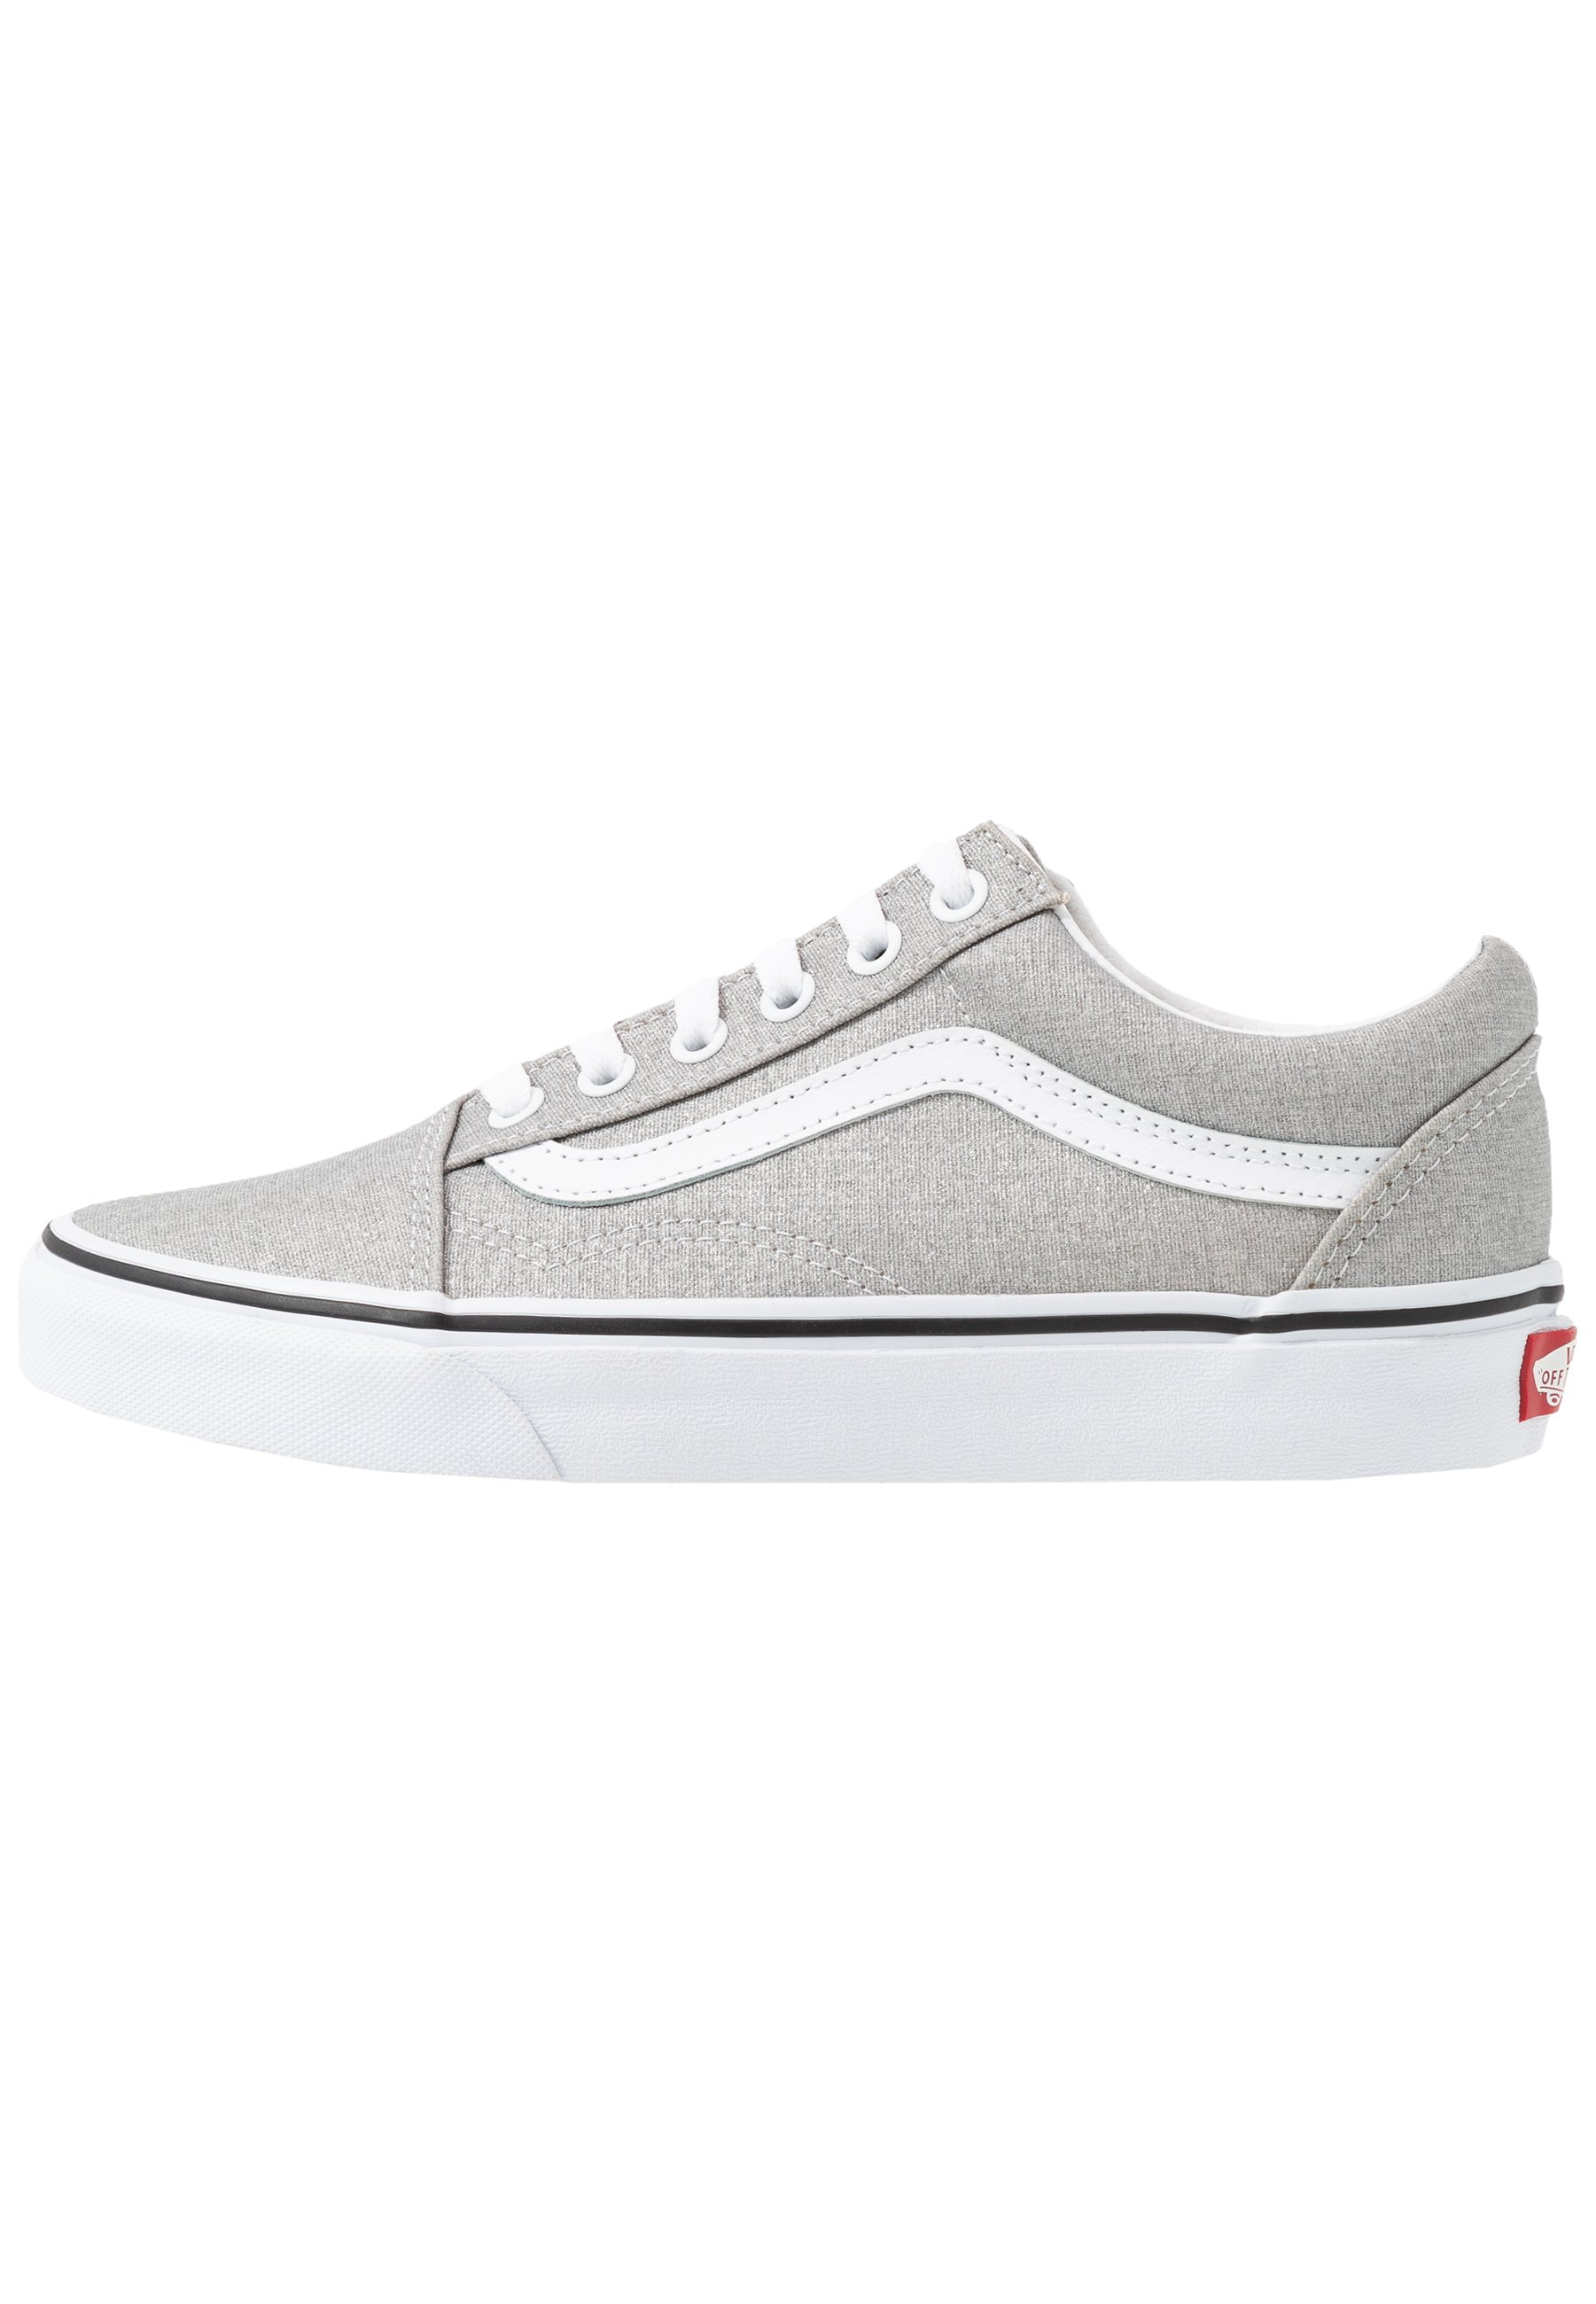 UA OLD SKOOL - Sneakers basse - silver/true white